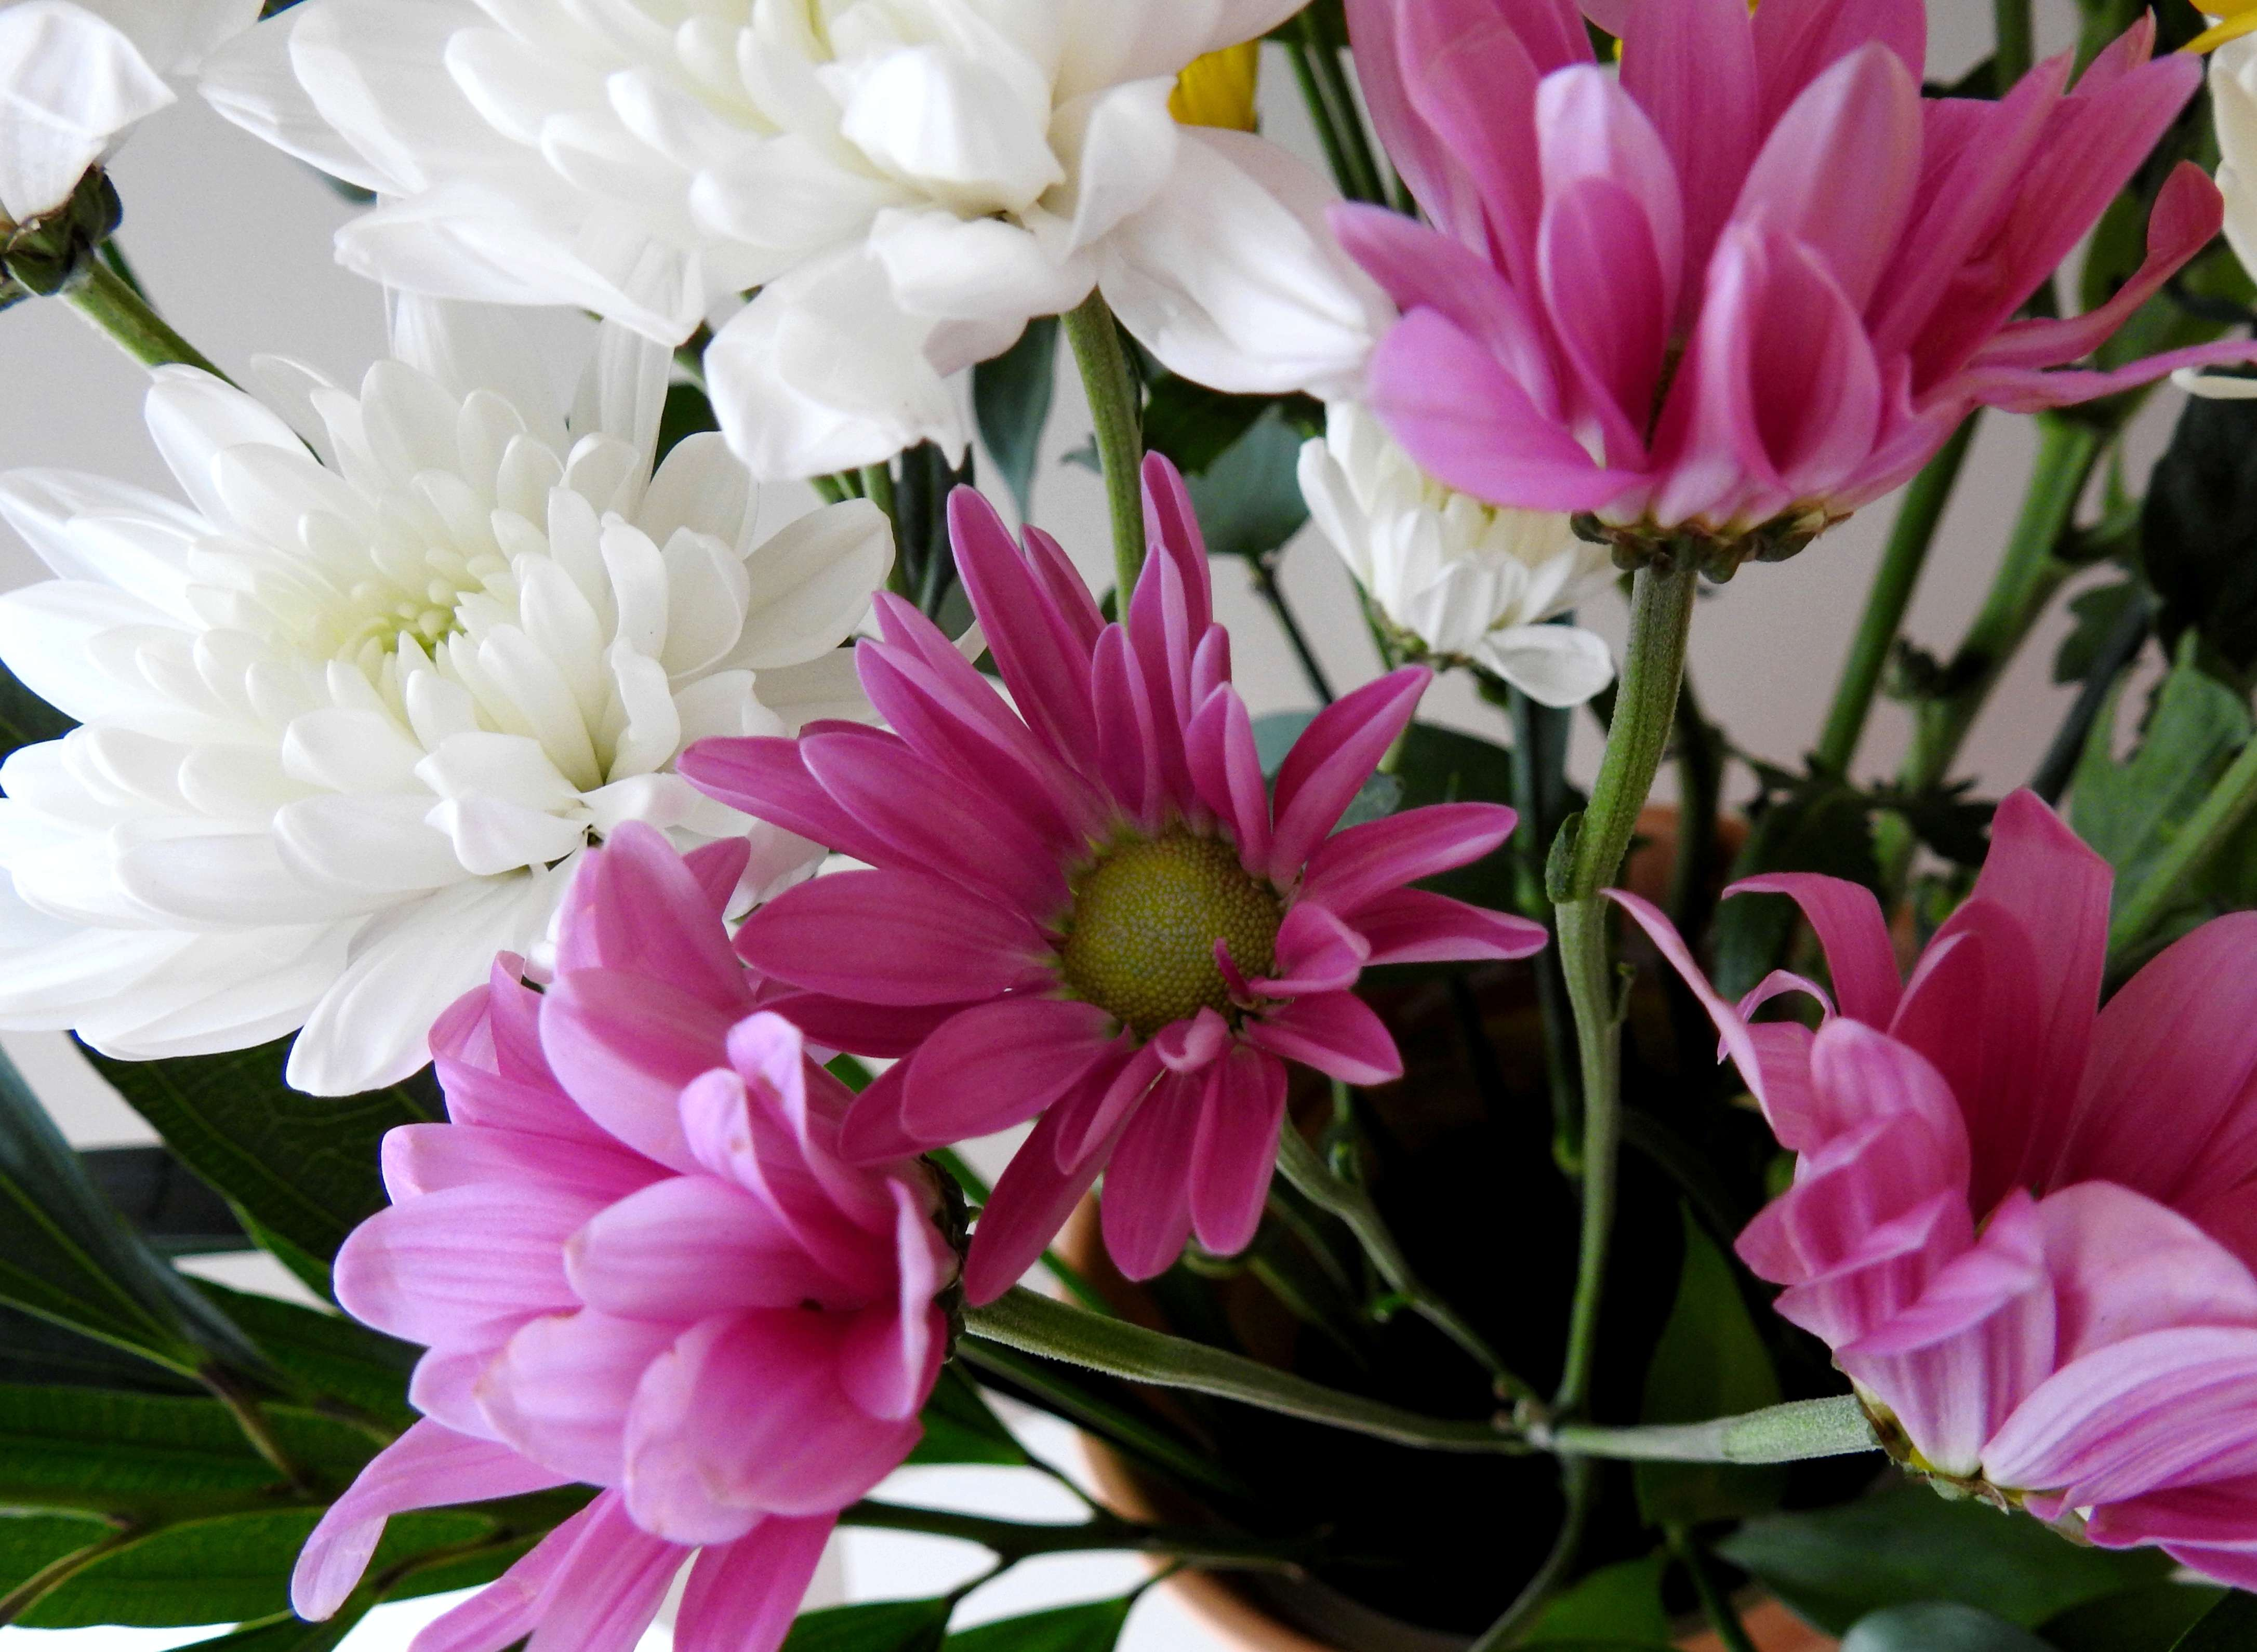 [Fil Ouvert] Fleurs - Page 21 R2018-11